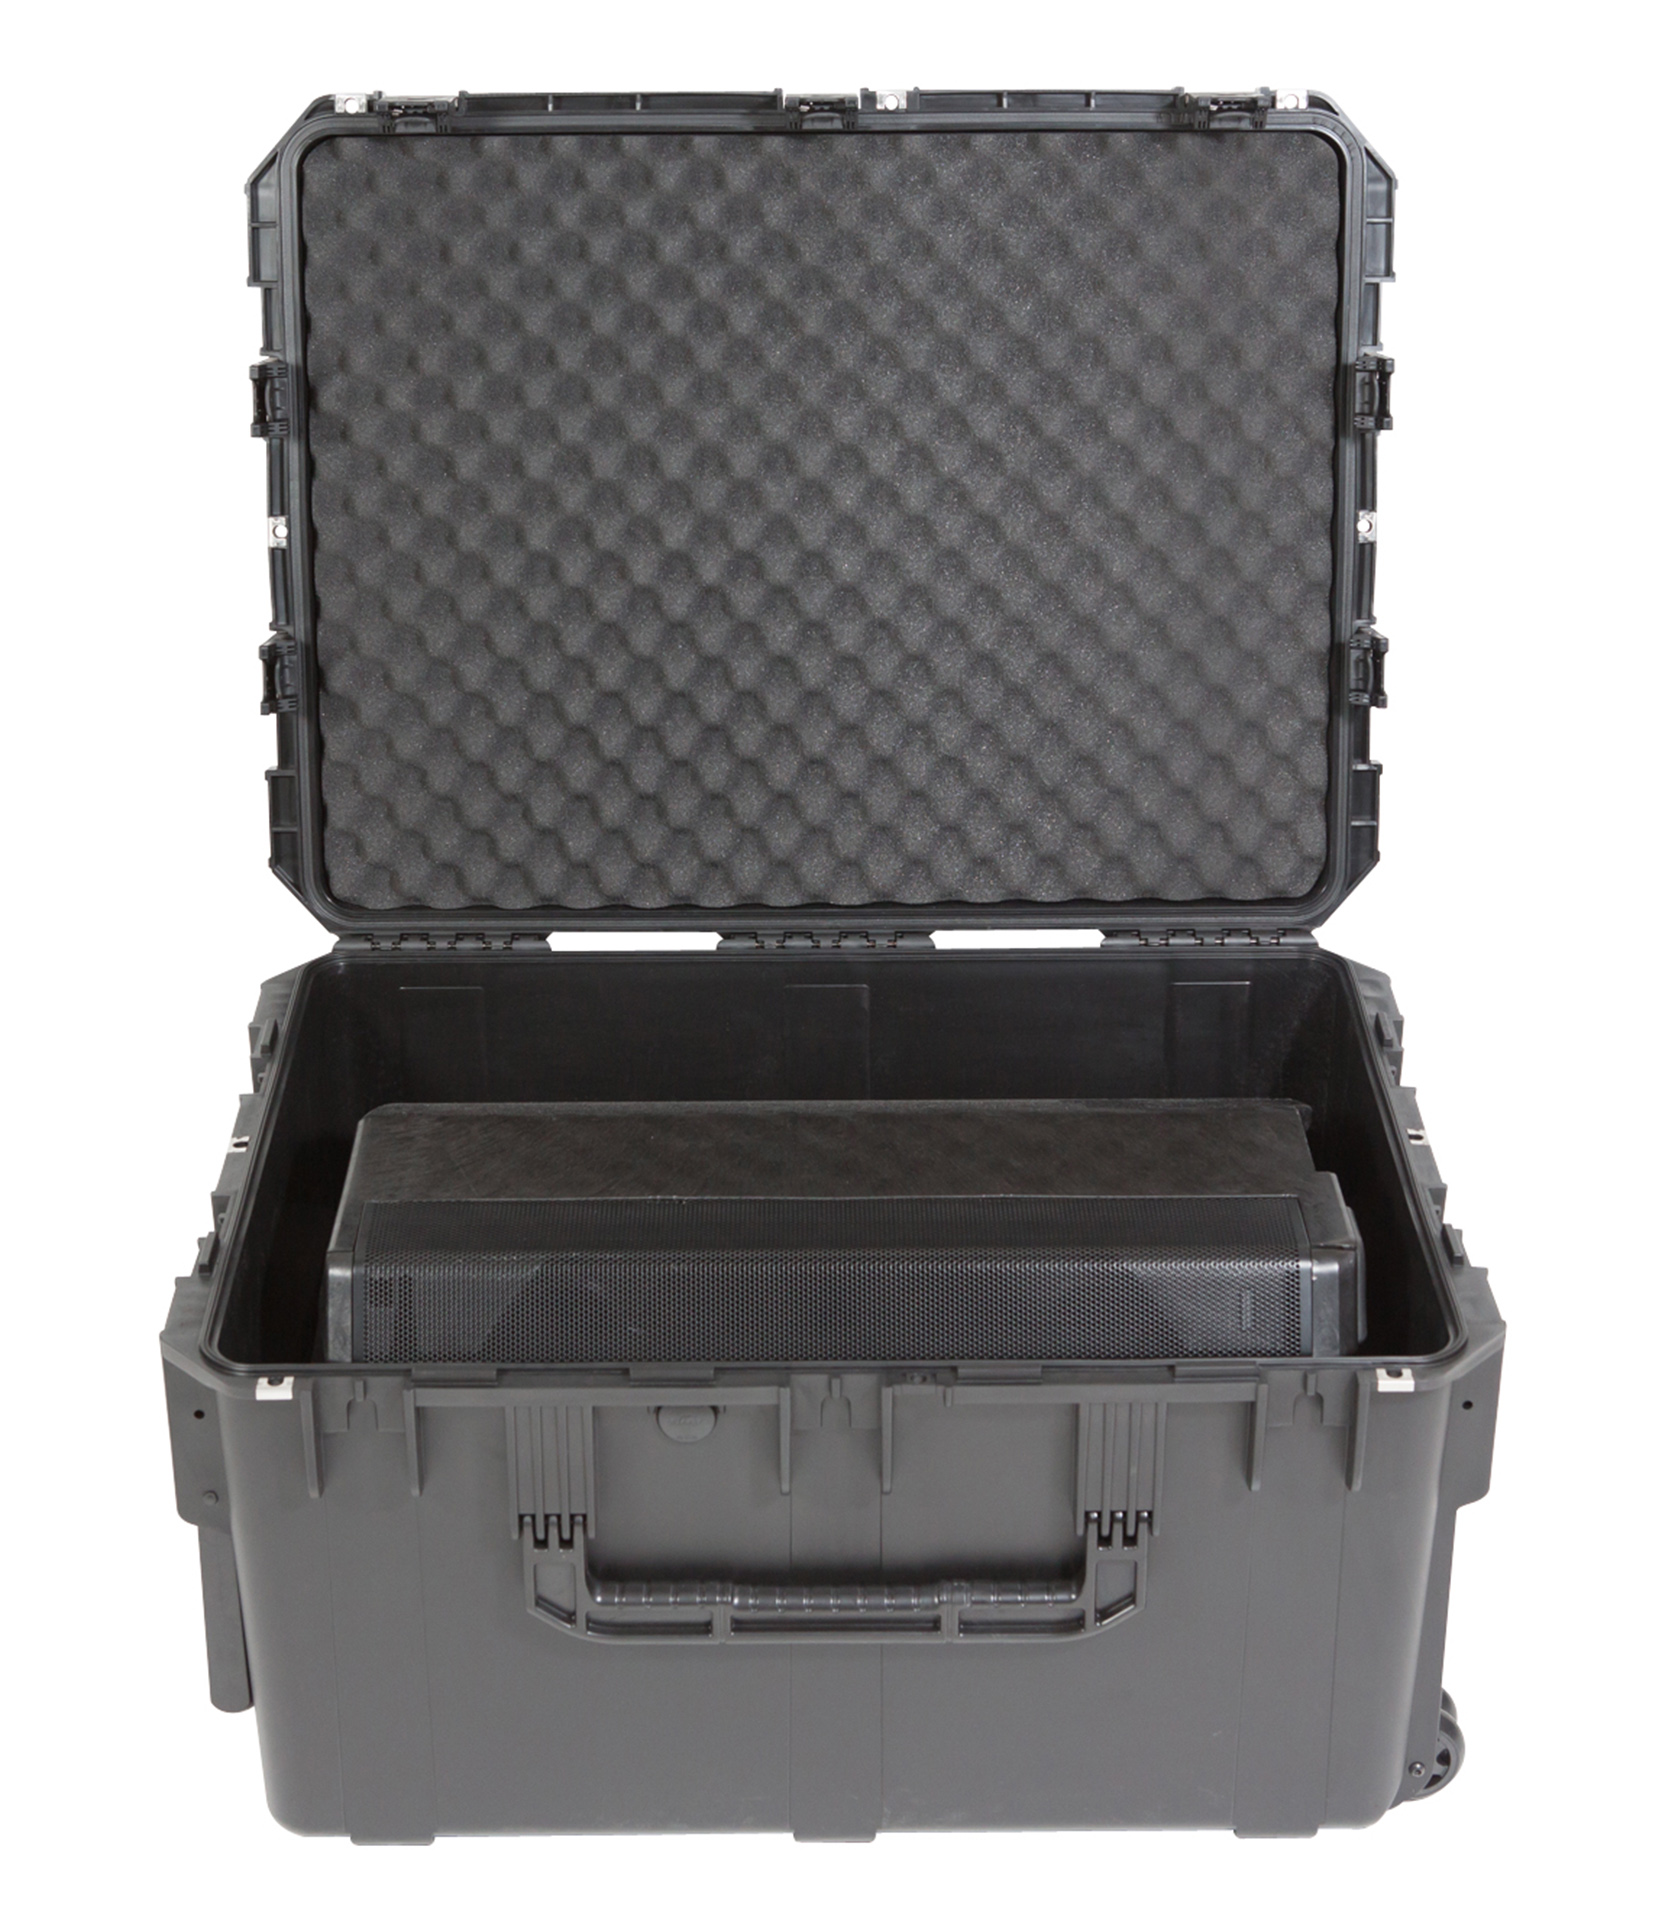 Buy skb 3i 2922 16BFBose F1 812 Loudspeaker case Melody House